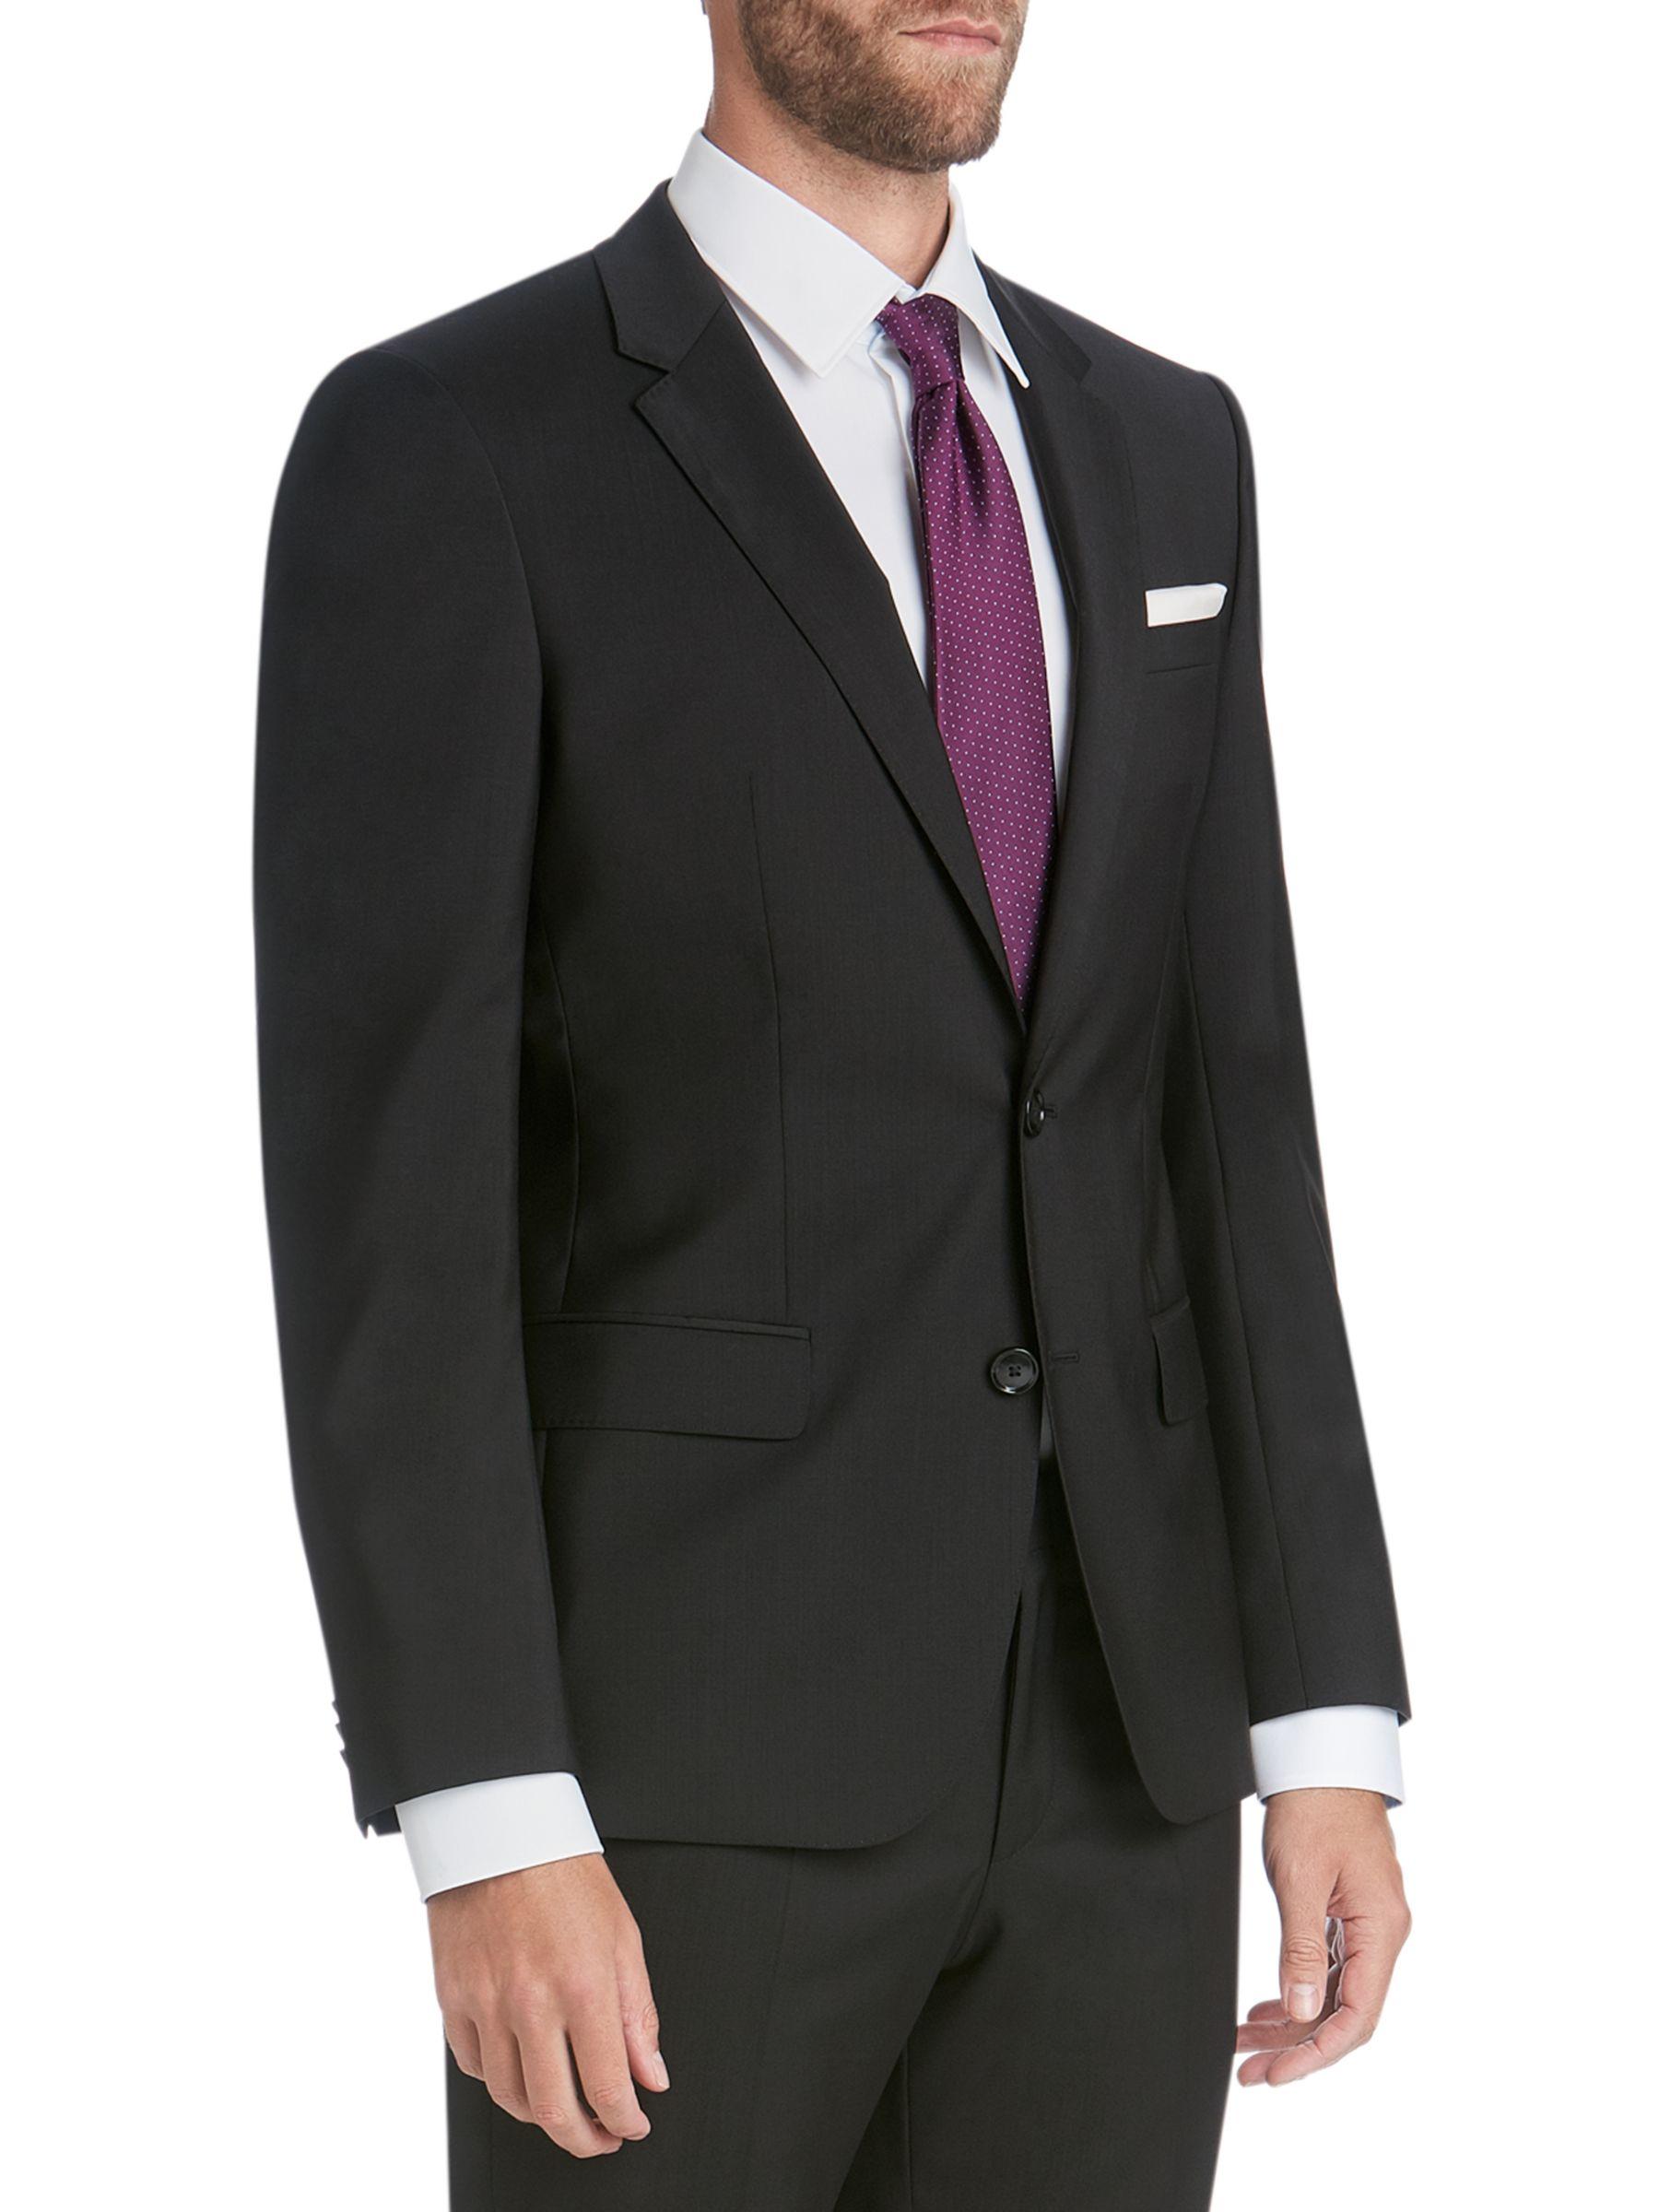 hugo boss suits sale uk